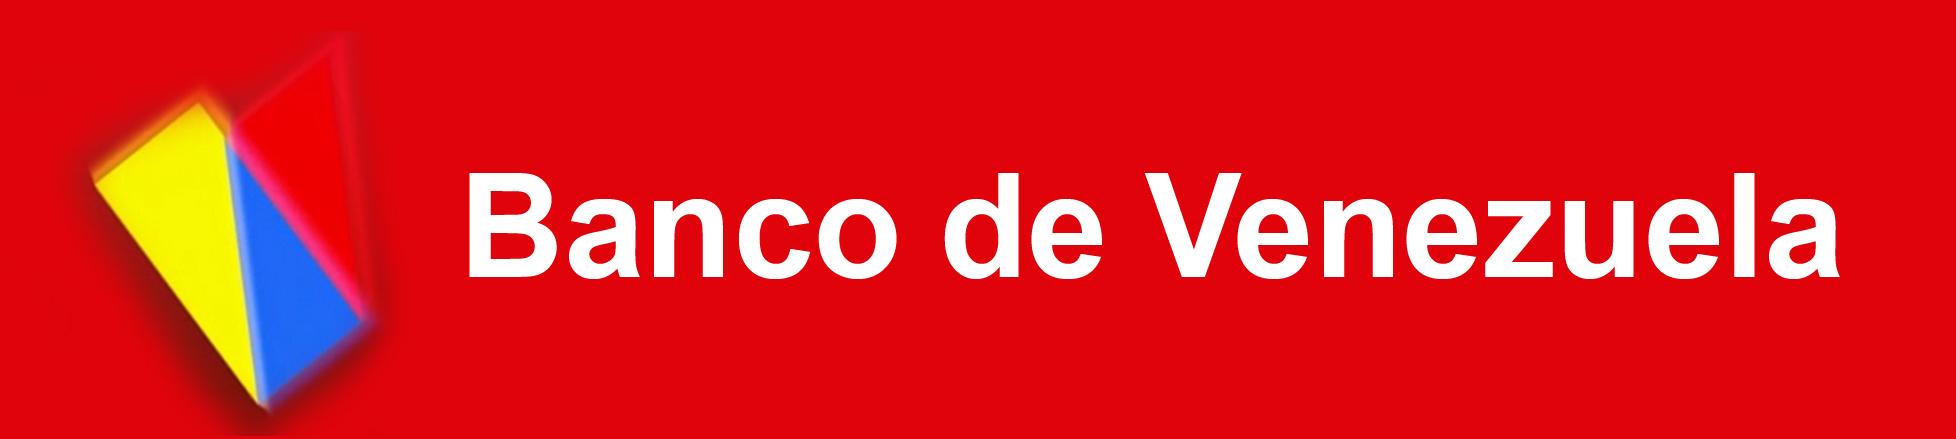 Ashampoo burning studio 9 03 serial inclusive for Banco exterior de venezuela